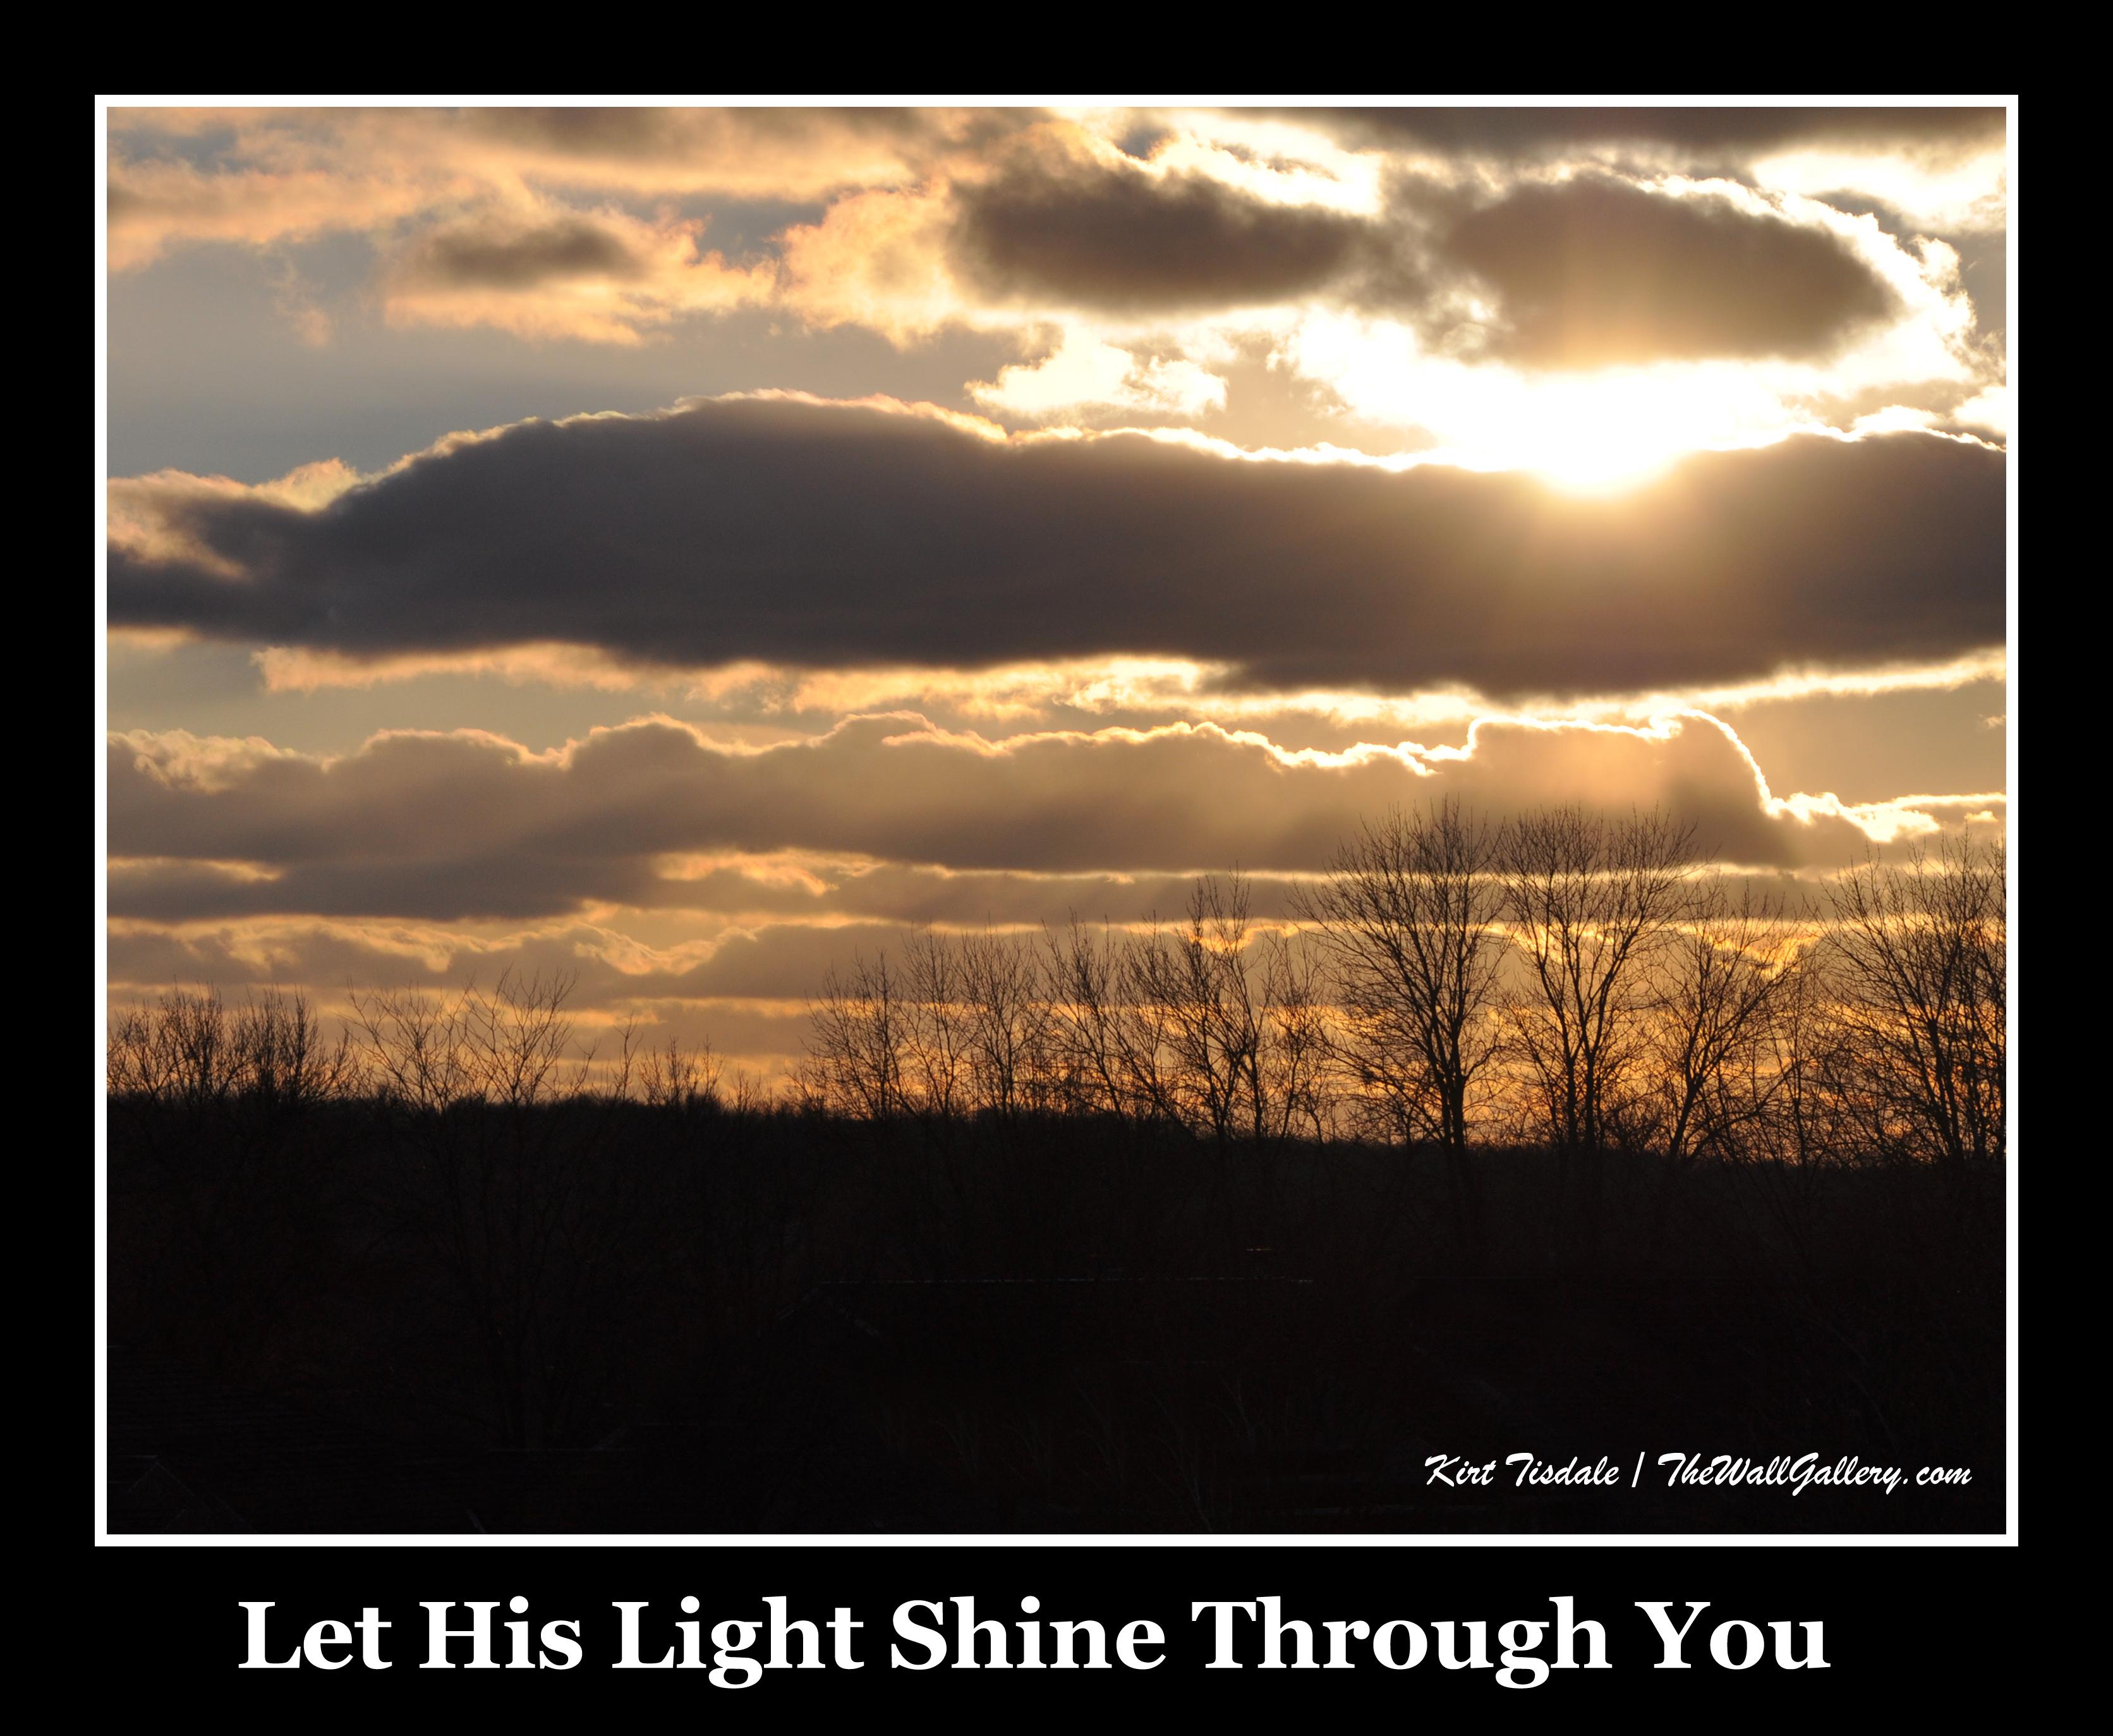 Let His Light Shine